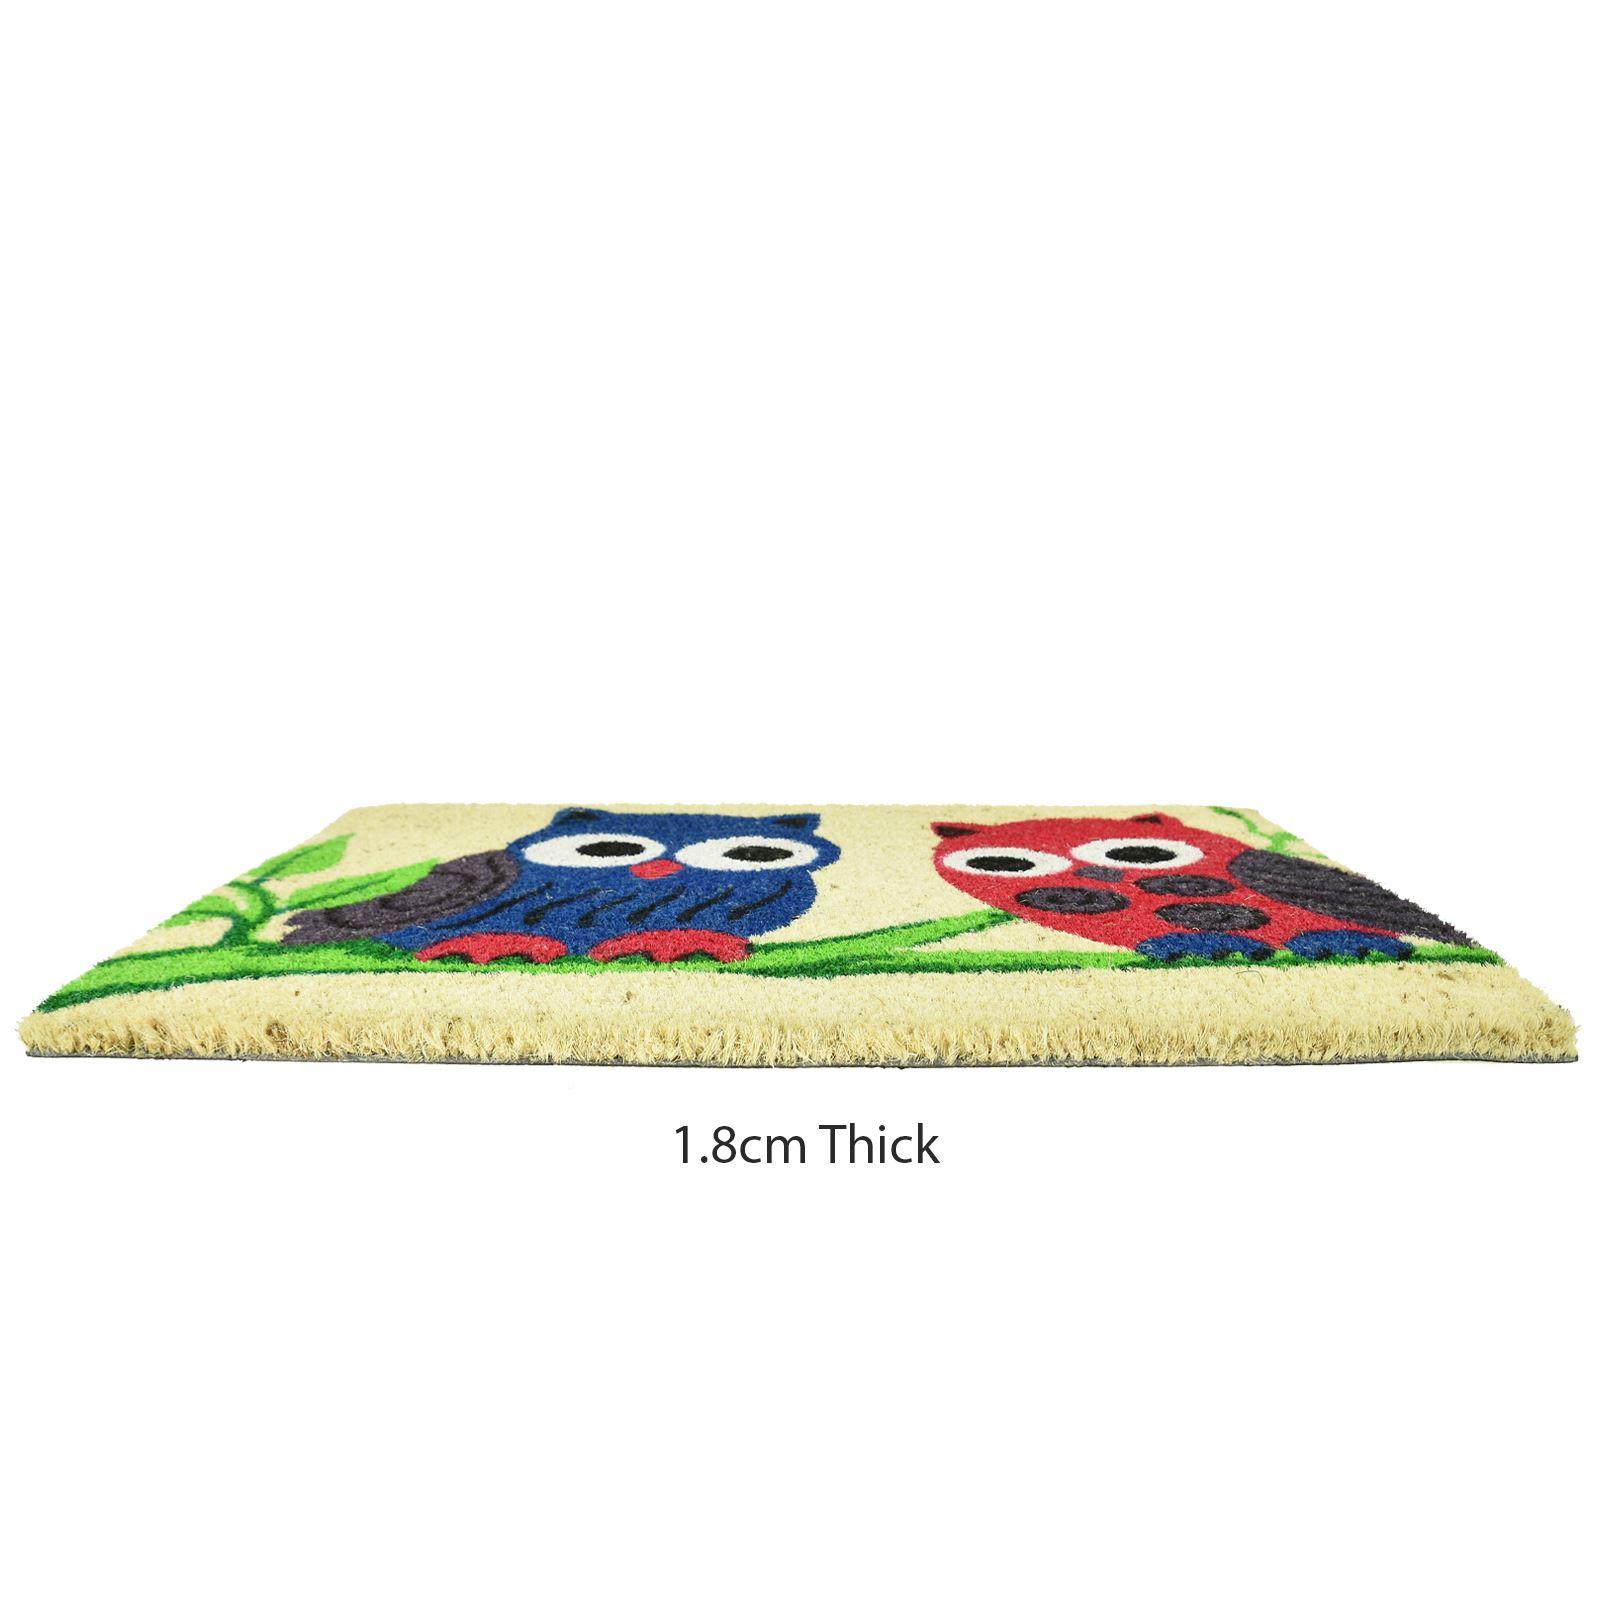 Plain-Non-Slip-Door-Mat-Tough-Natural-Coir-PVC-Back-Welcome-Doormat-40-x-60cm miniatura 28